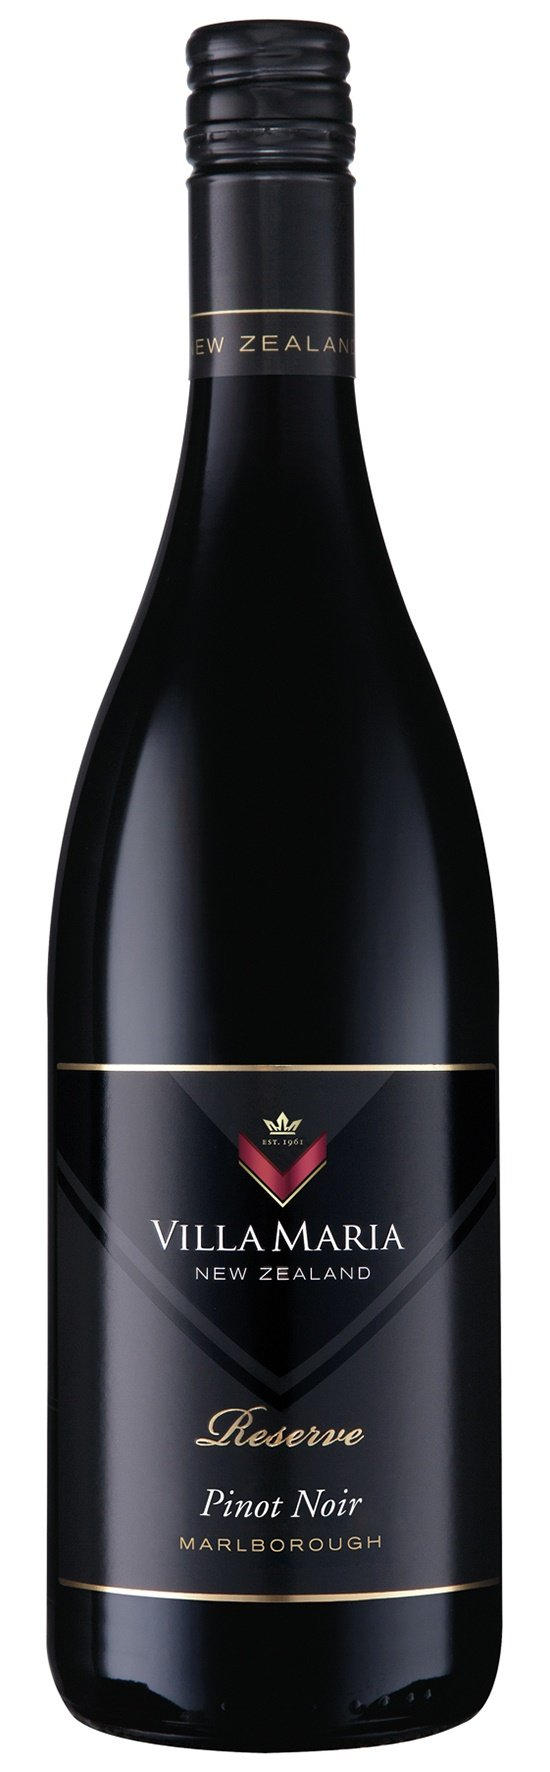 6x-075l-2017er-Villa-Maria-Reserve-Pinot-Noir-Marlborough-Neuseeland-Rotwein-trocken